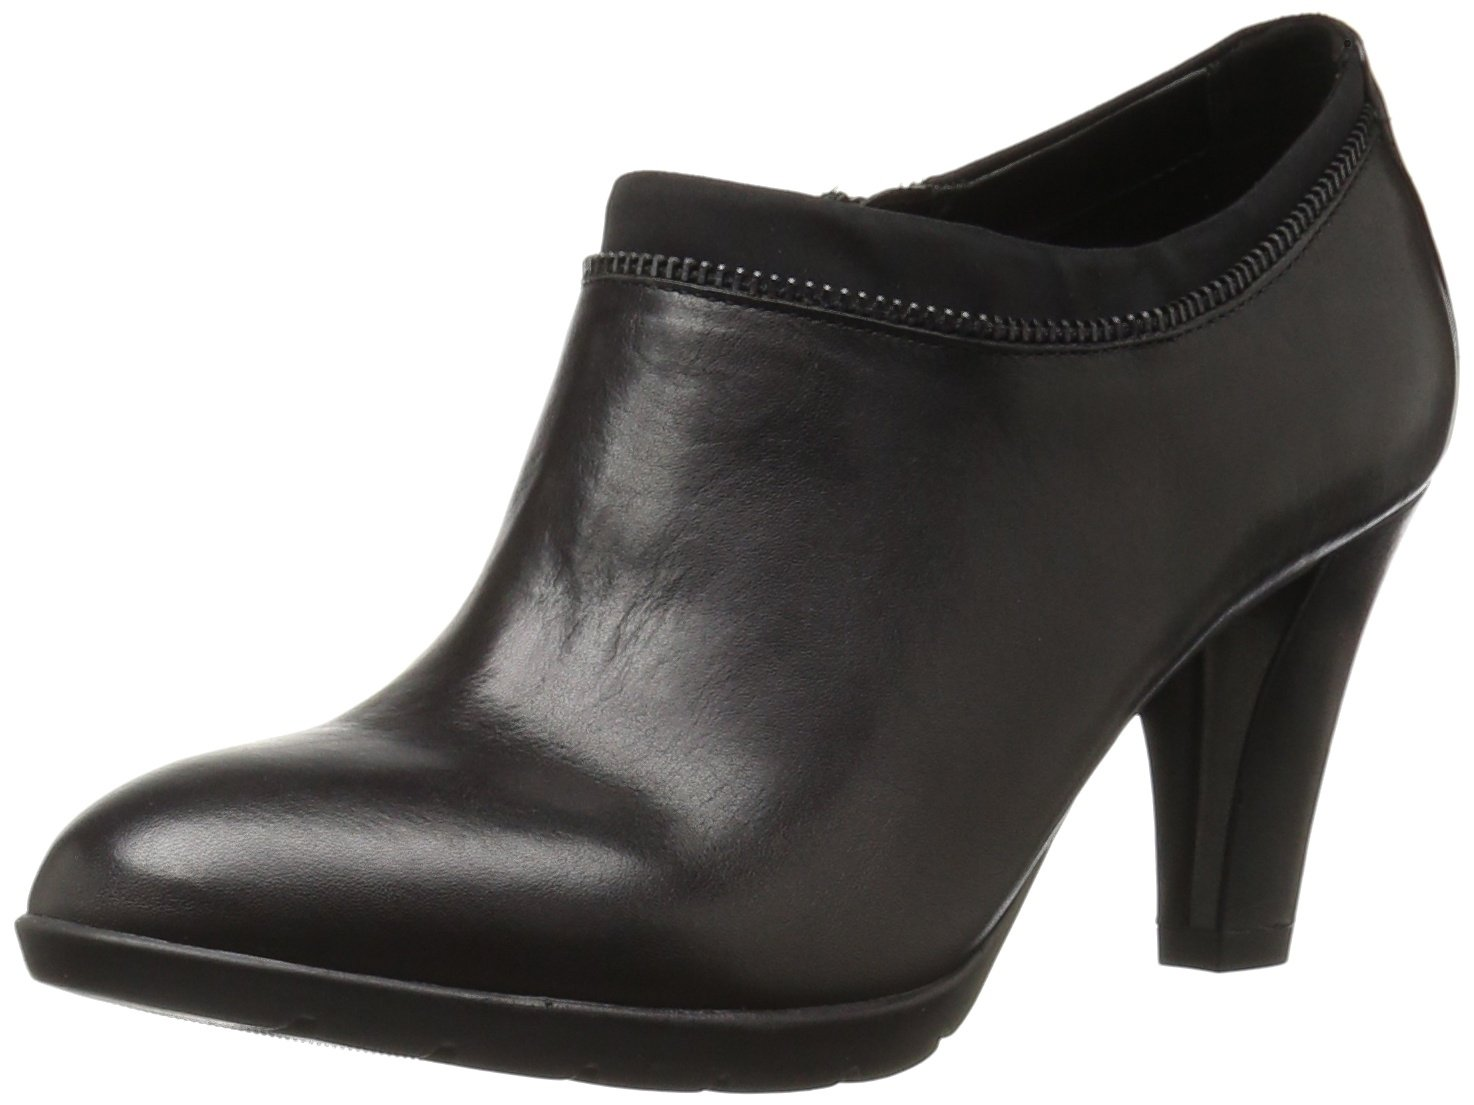 Anne Klein Women's Dalayne Ankle Bootie B0059M8RC2 7 B(M) US|Black